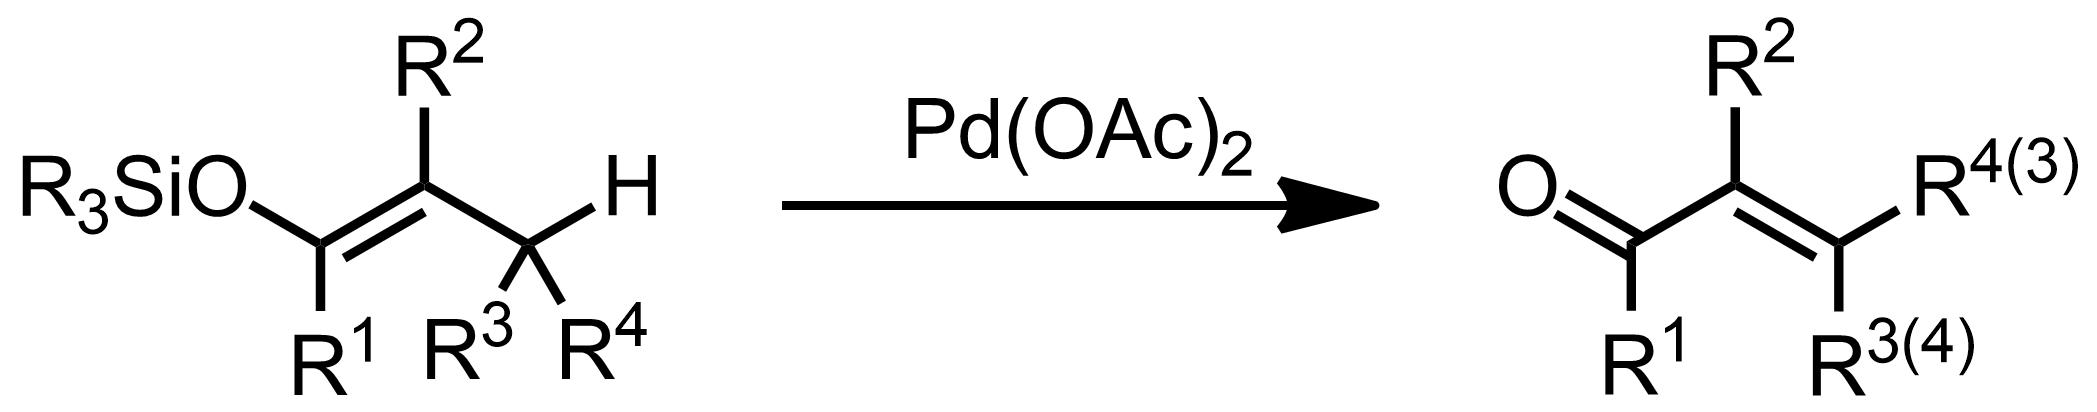 Schematic representation of the Saegusa-Ito Oxidation.